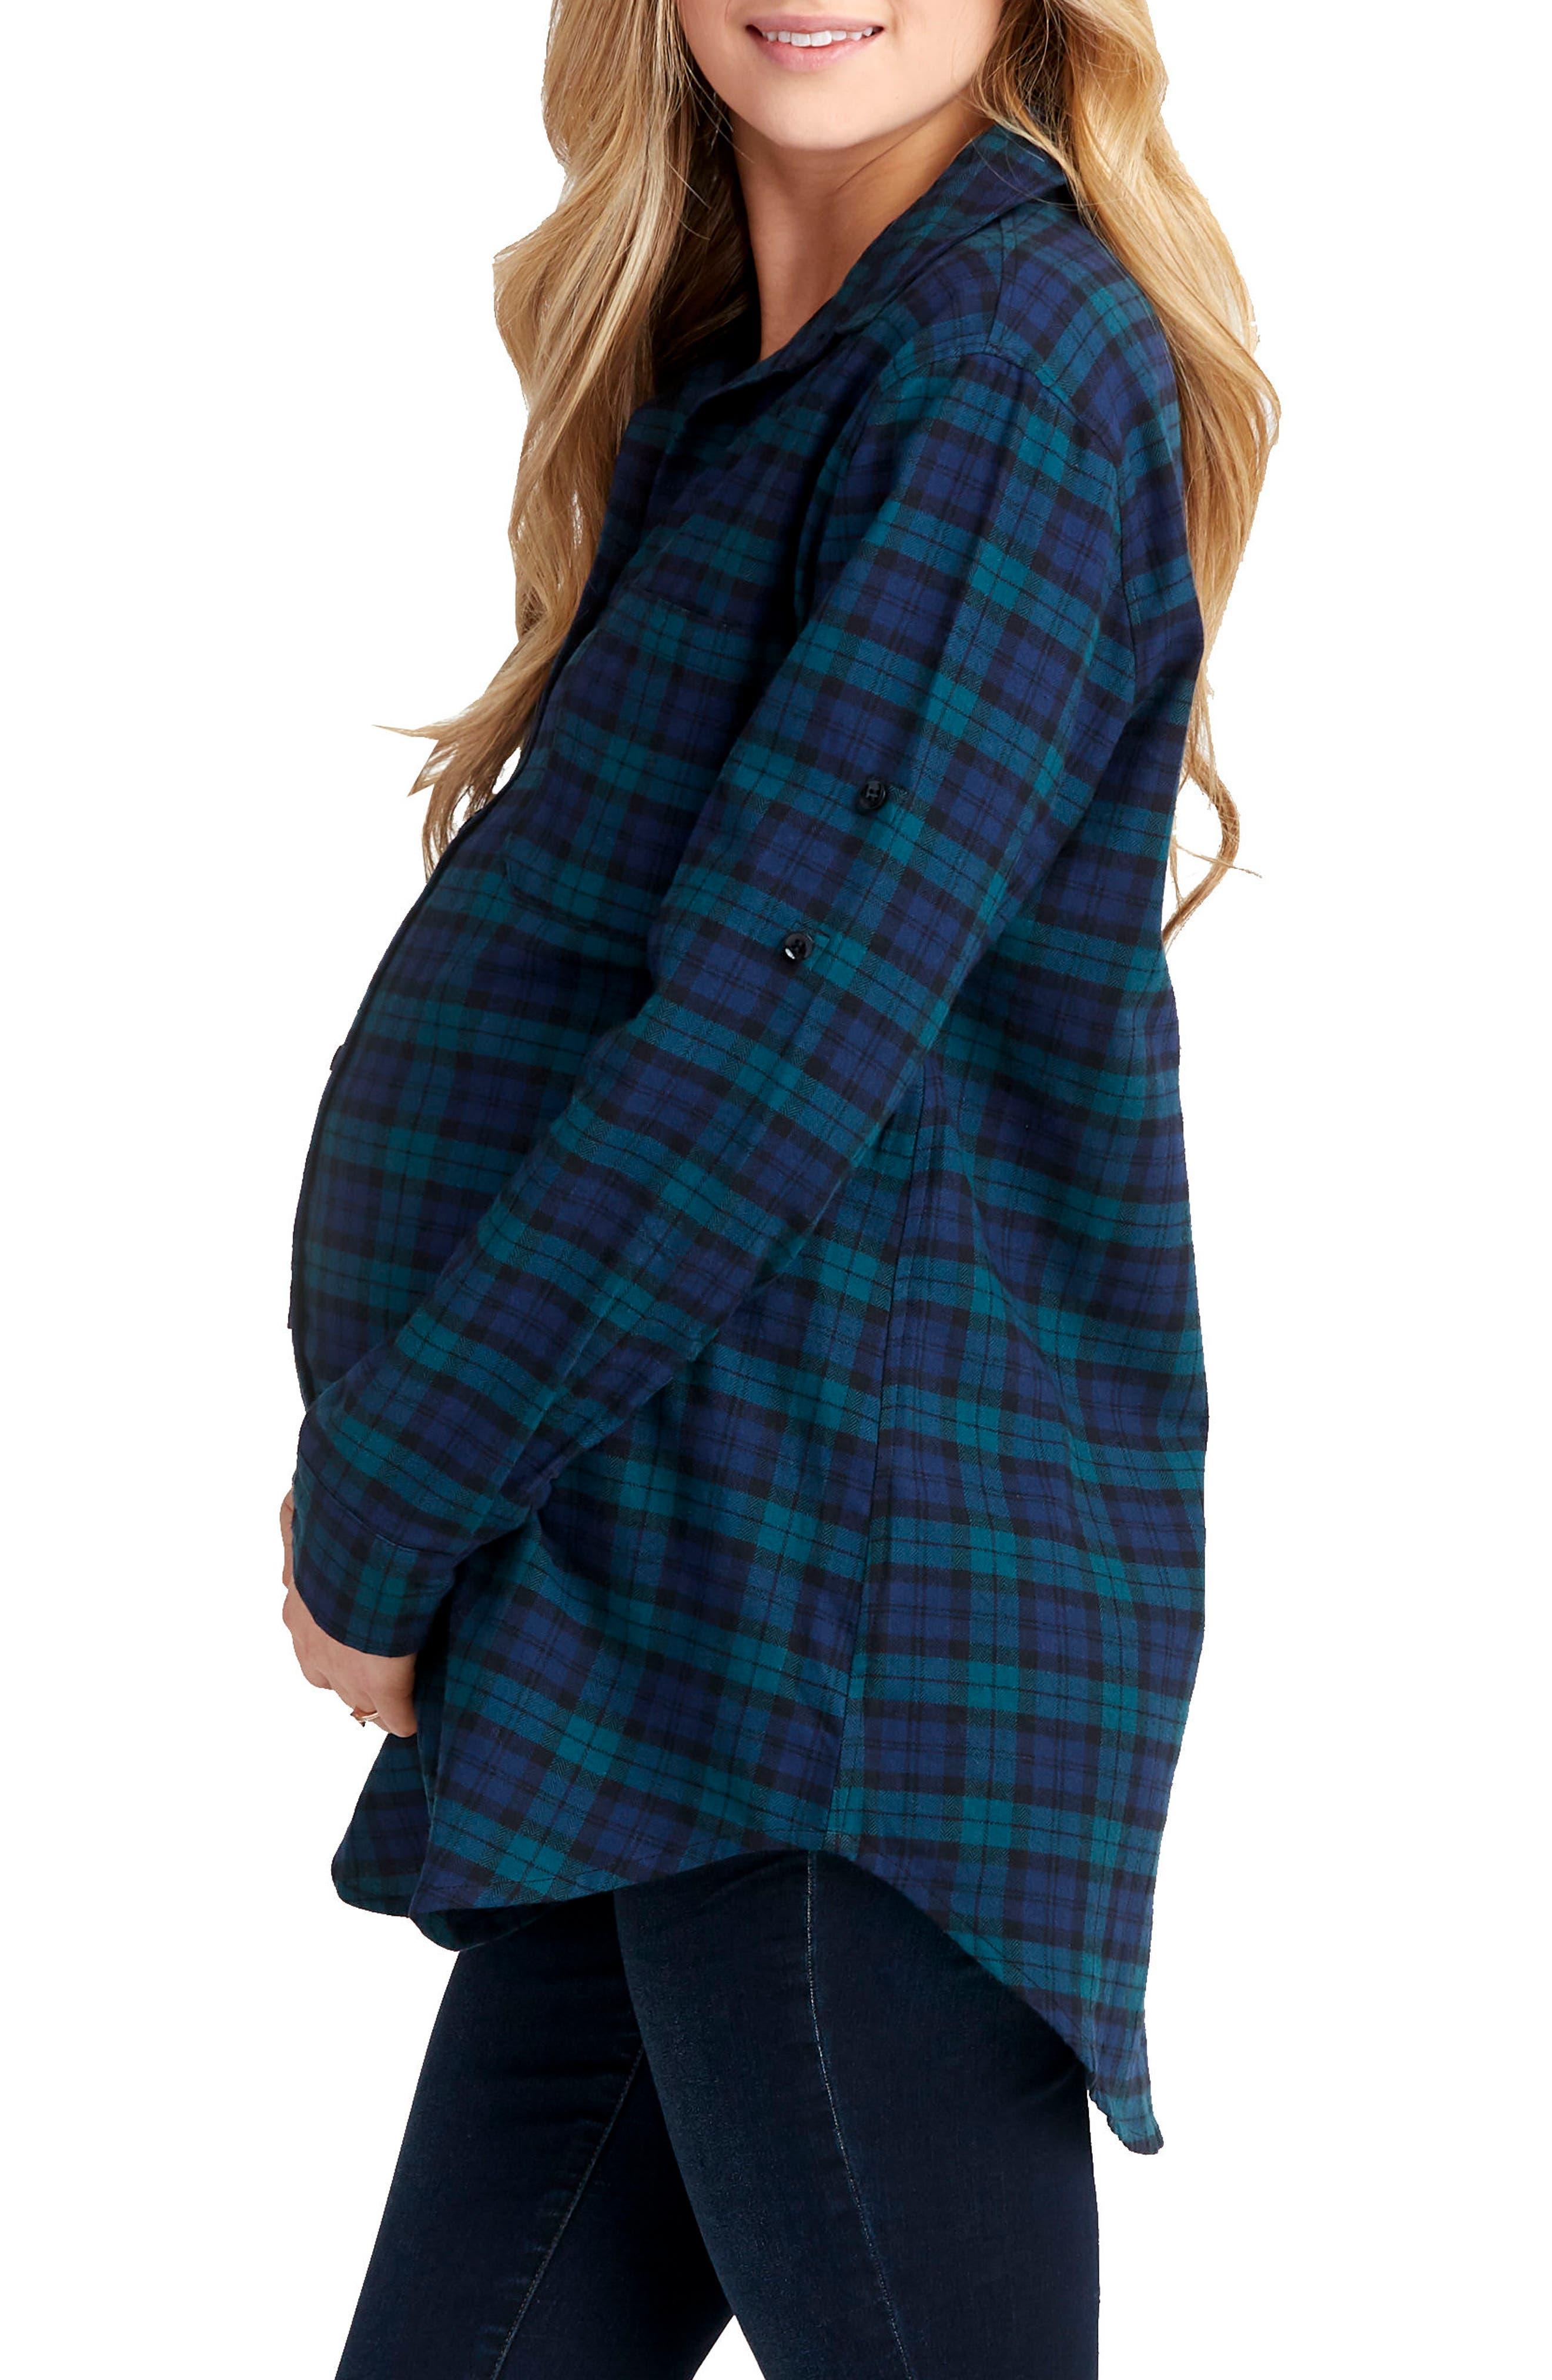 Sadie Maternity/Nursing Shirt,                             Alternate thumbnail 3, color,                             BLUE GREEN PLAID